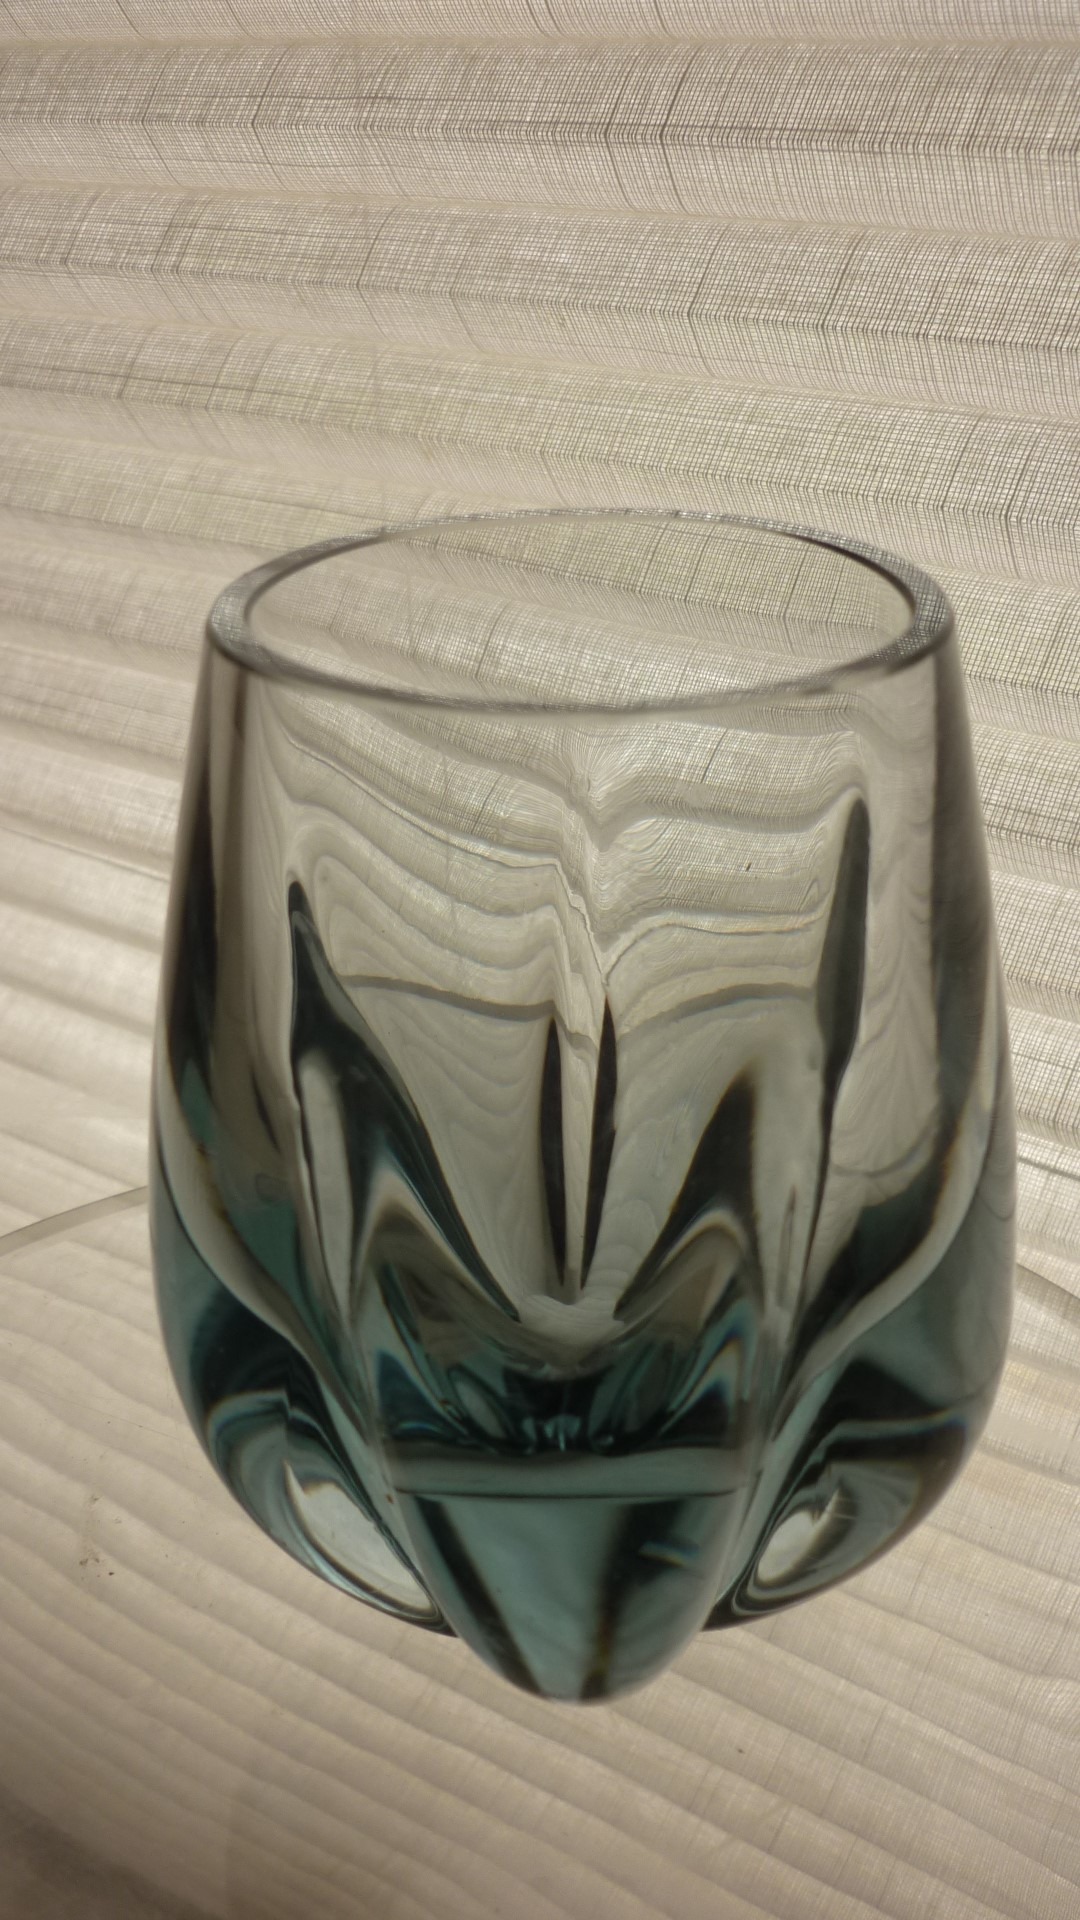 1960s Vintage Whitefriars Pattern 9392 Geoffrey Baxter Lobed Glass Vase in  Arctic  Blue